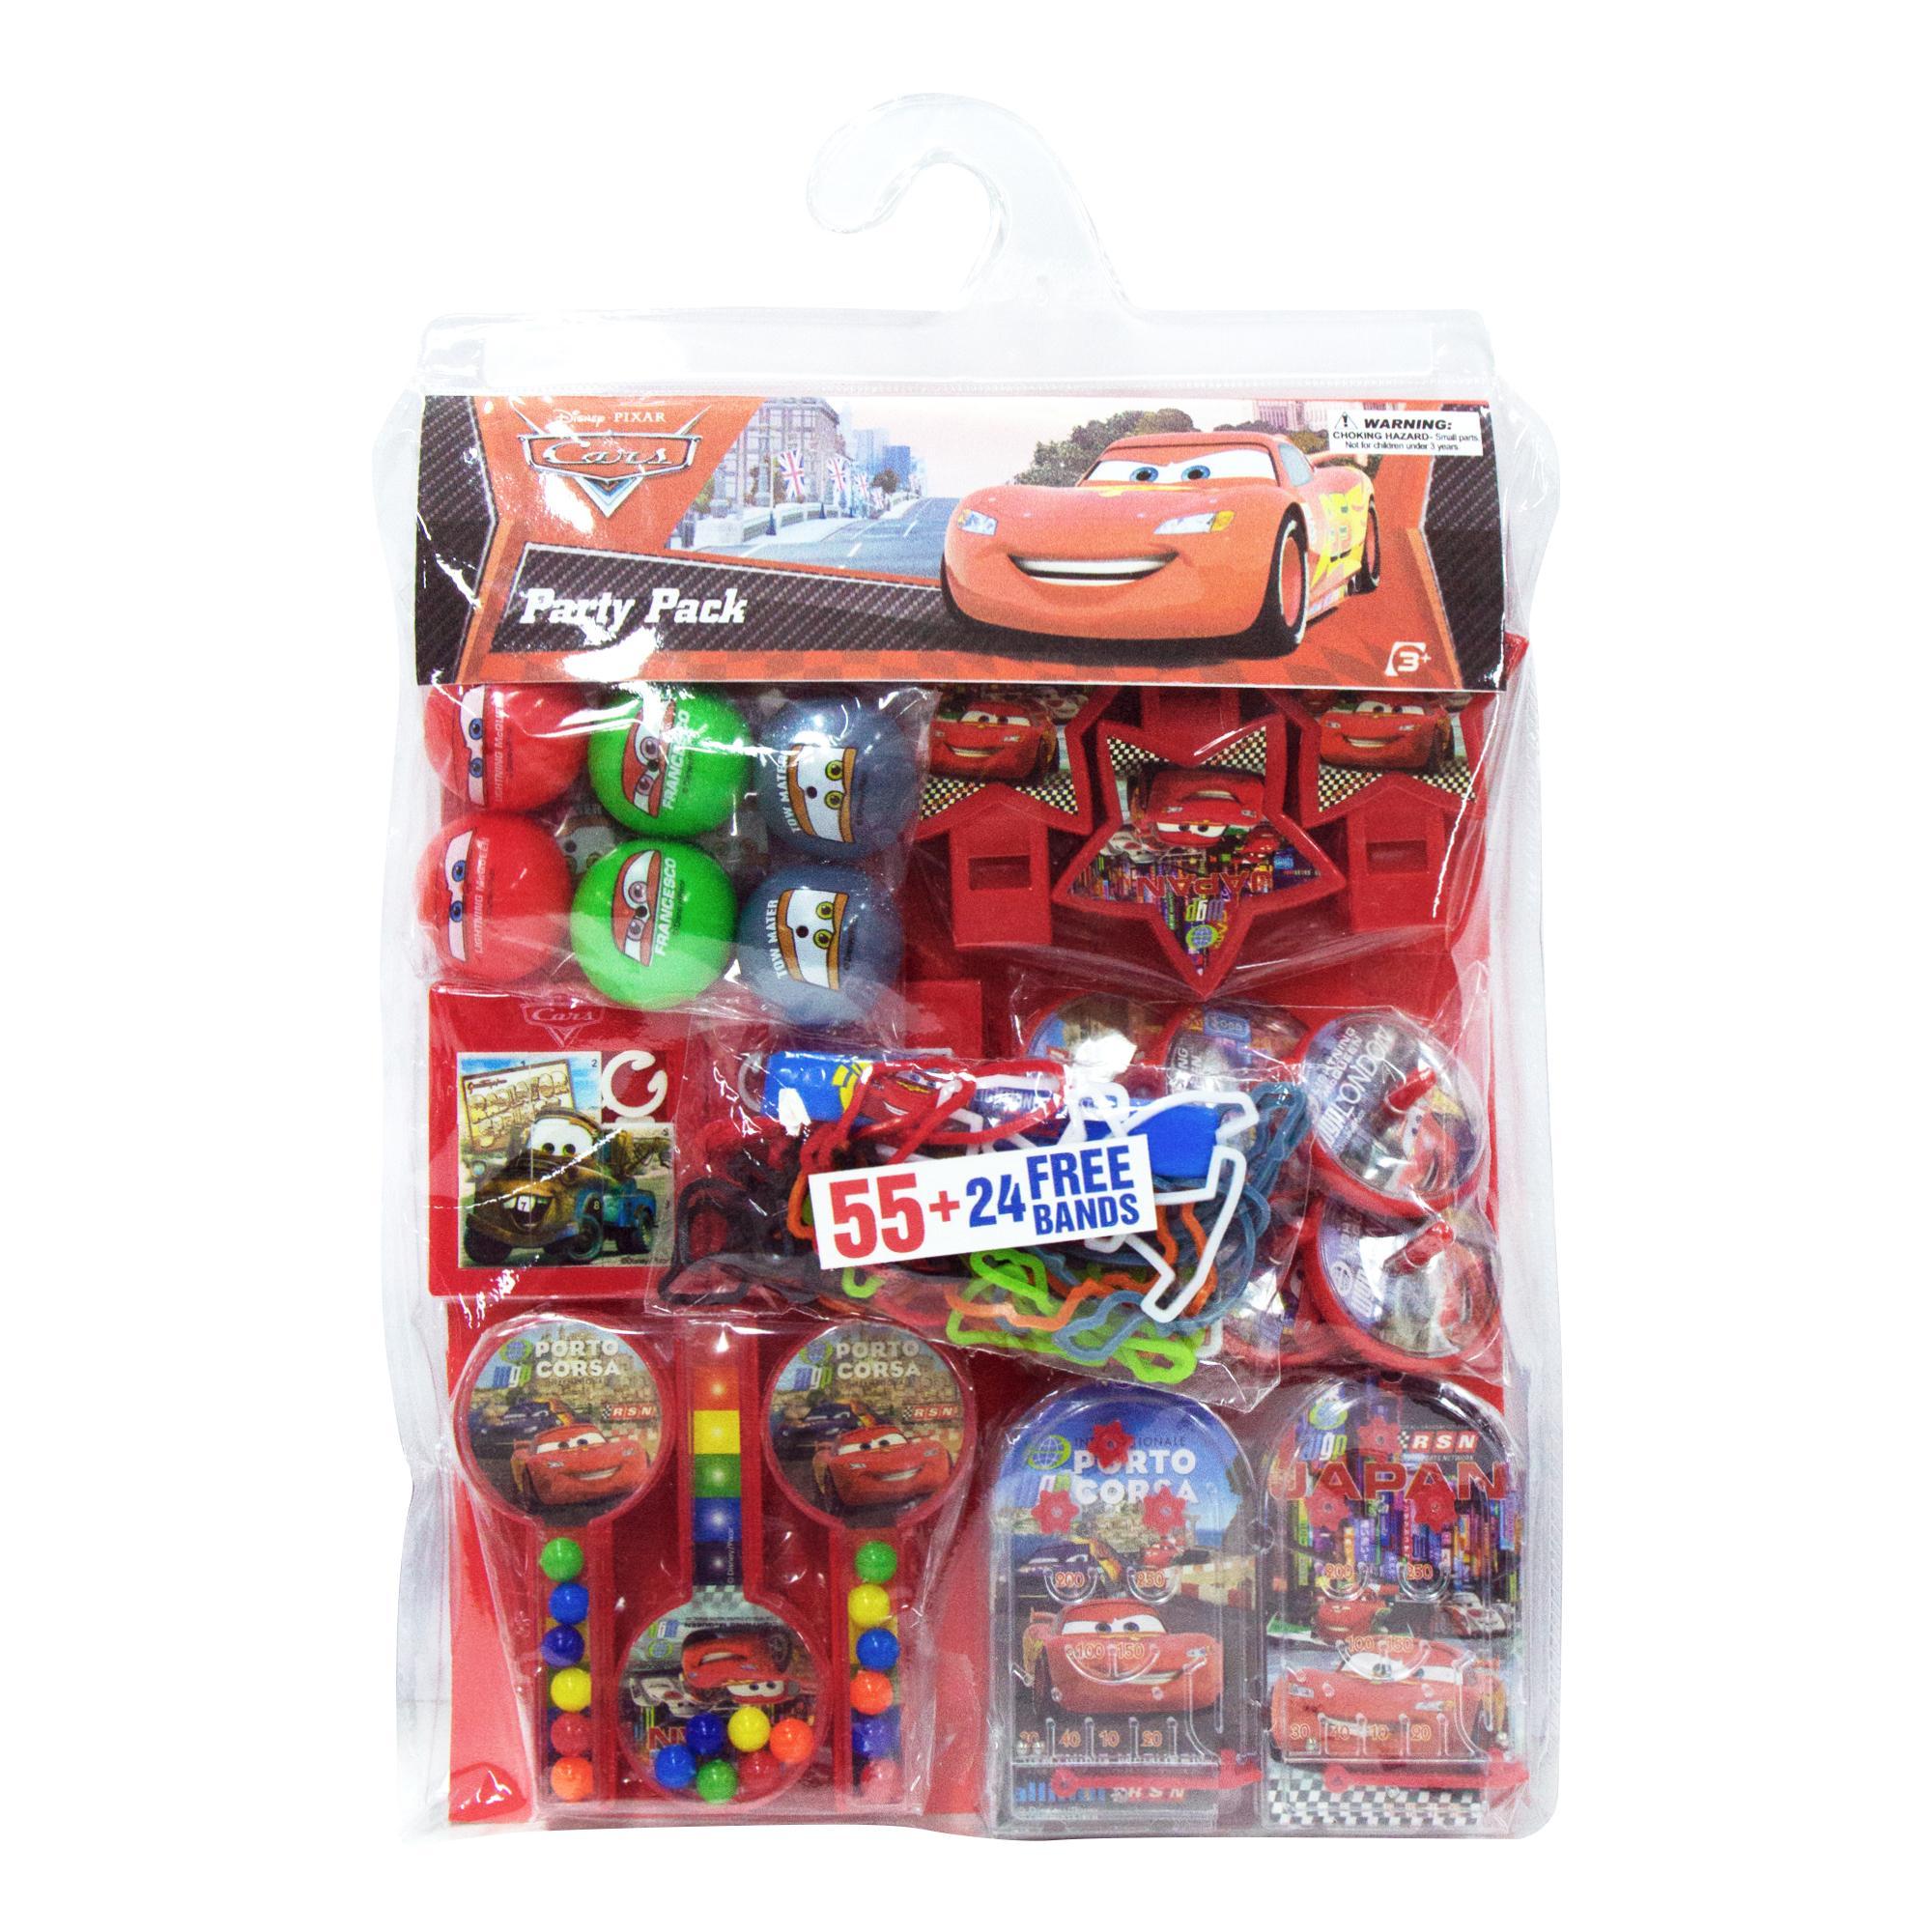 Disney Cars Party Pack - Set E (55 Pcs + 24 Free) By Momoe.